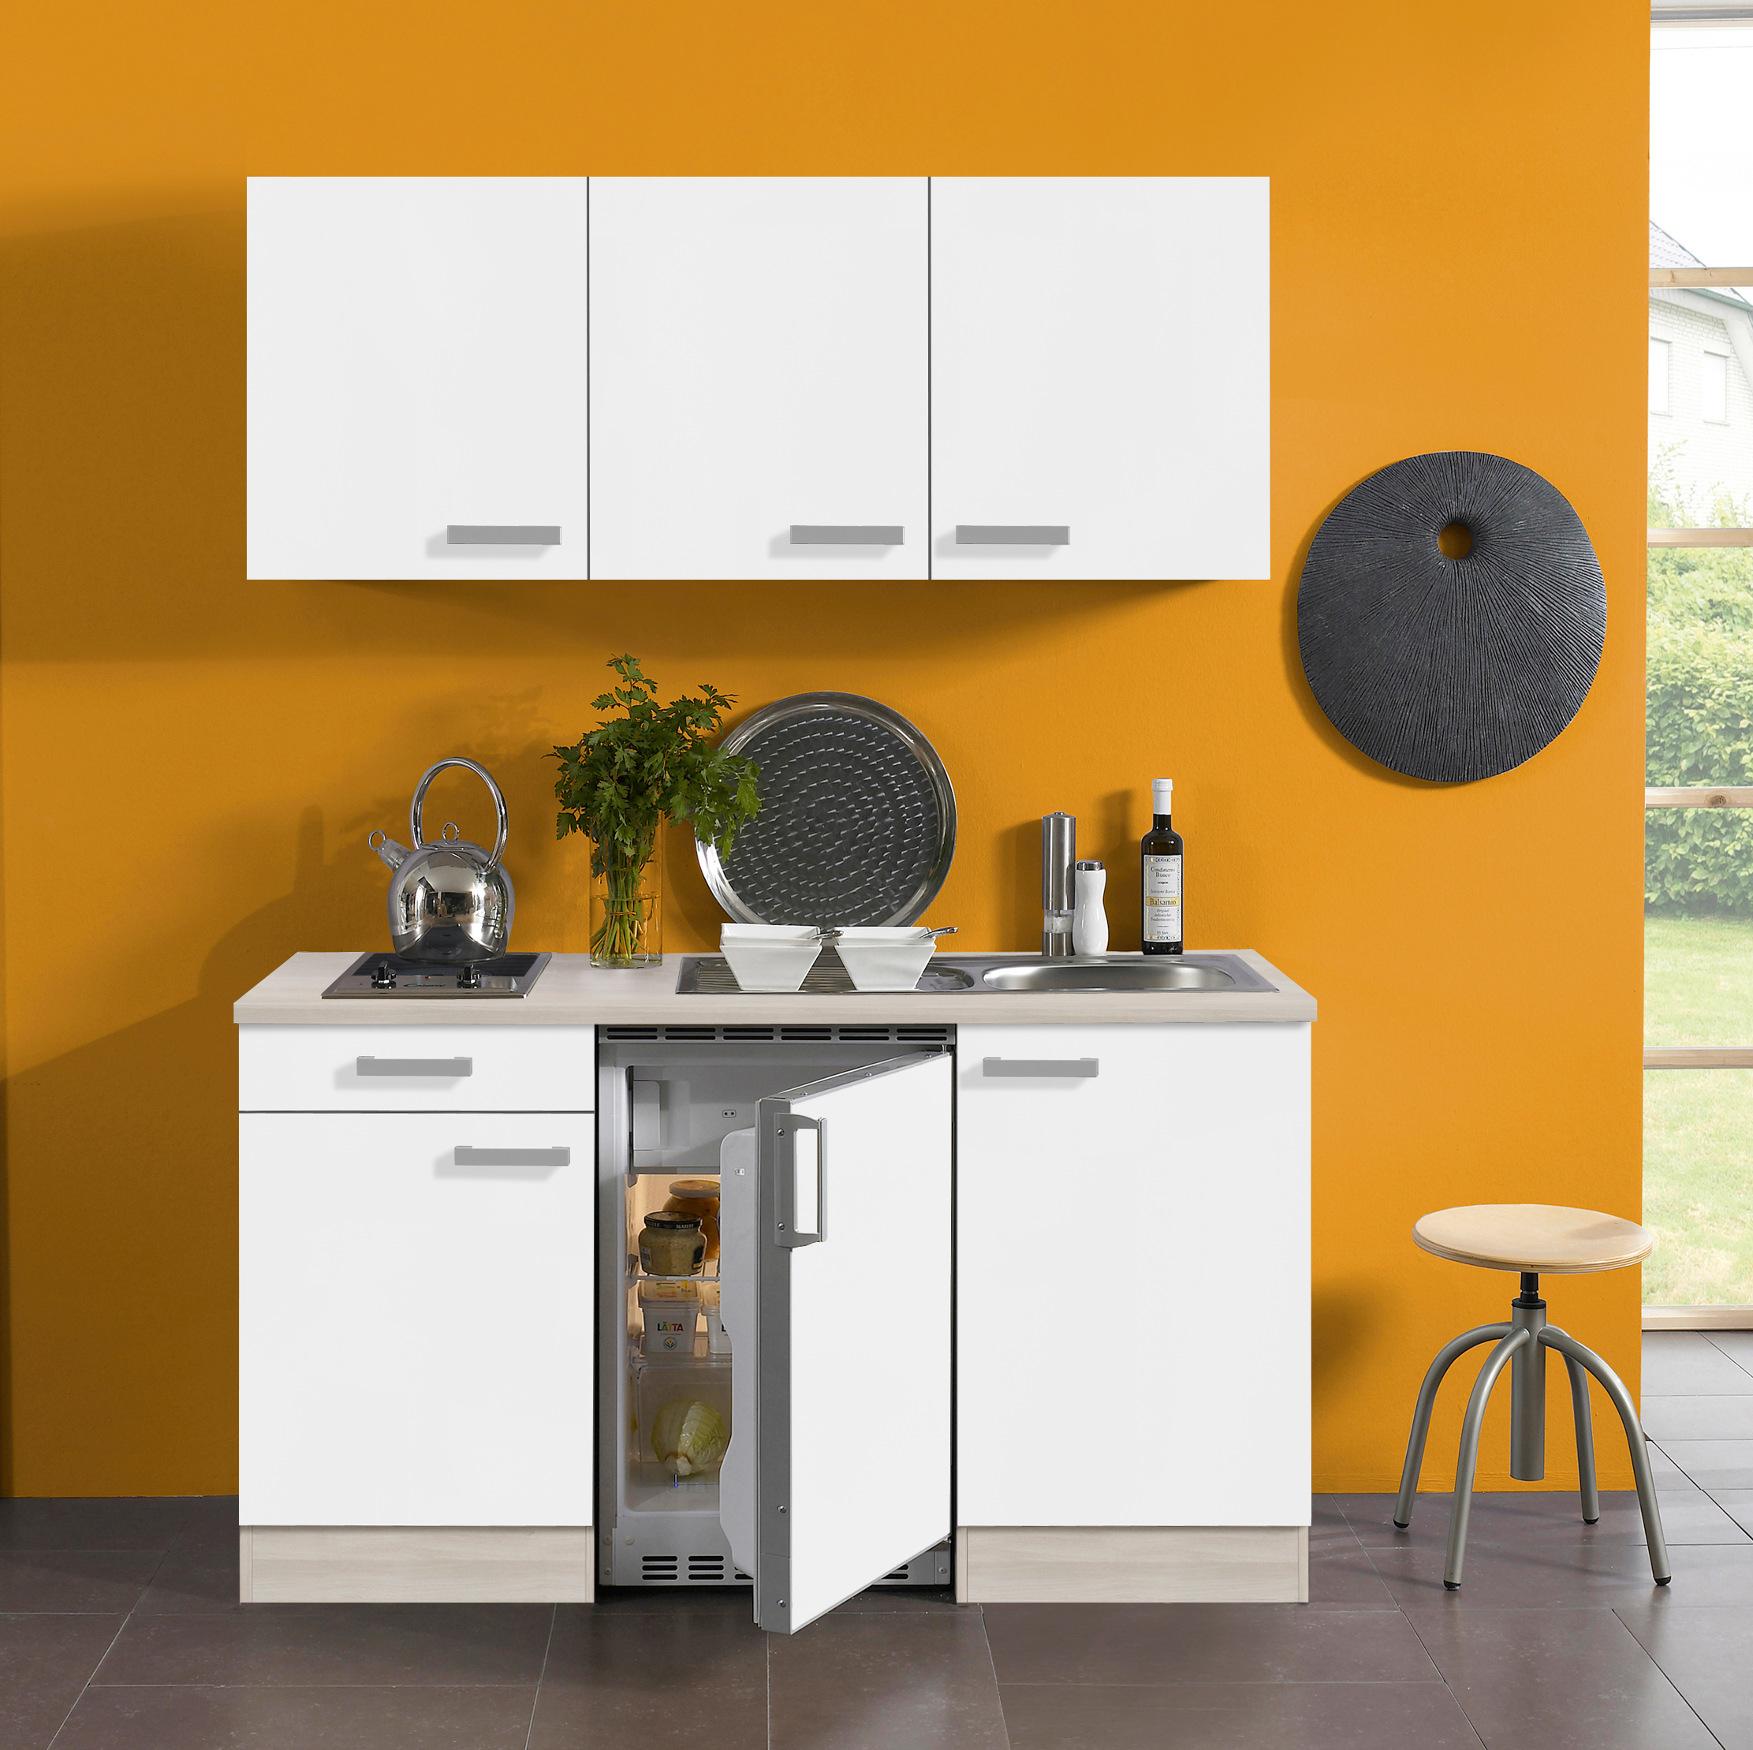 singlek che barcelona glaskeramik kochfeld 8 teilig. Black Bedroom Furniture Sets. Home Design Ideas